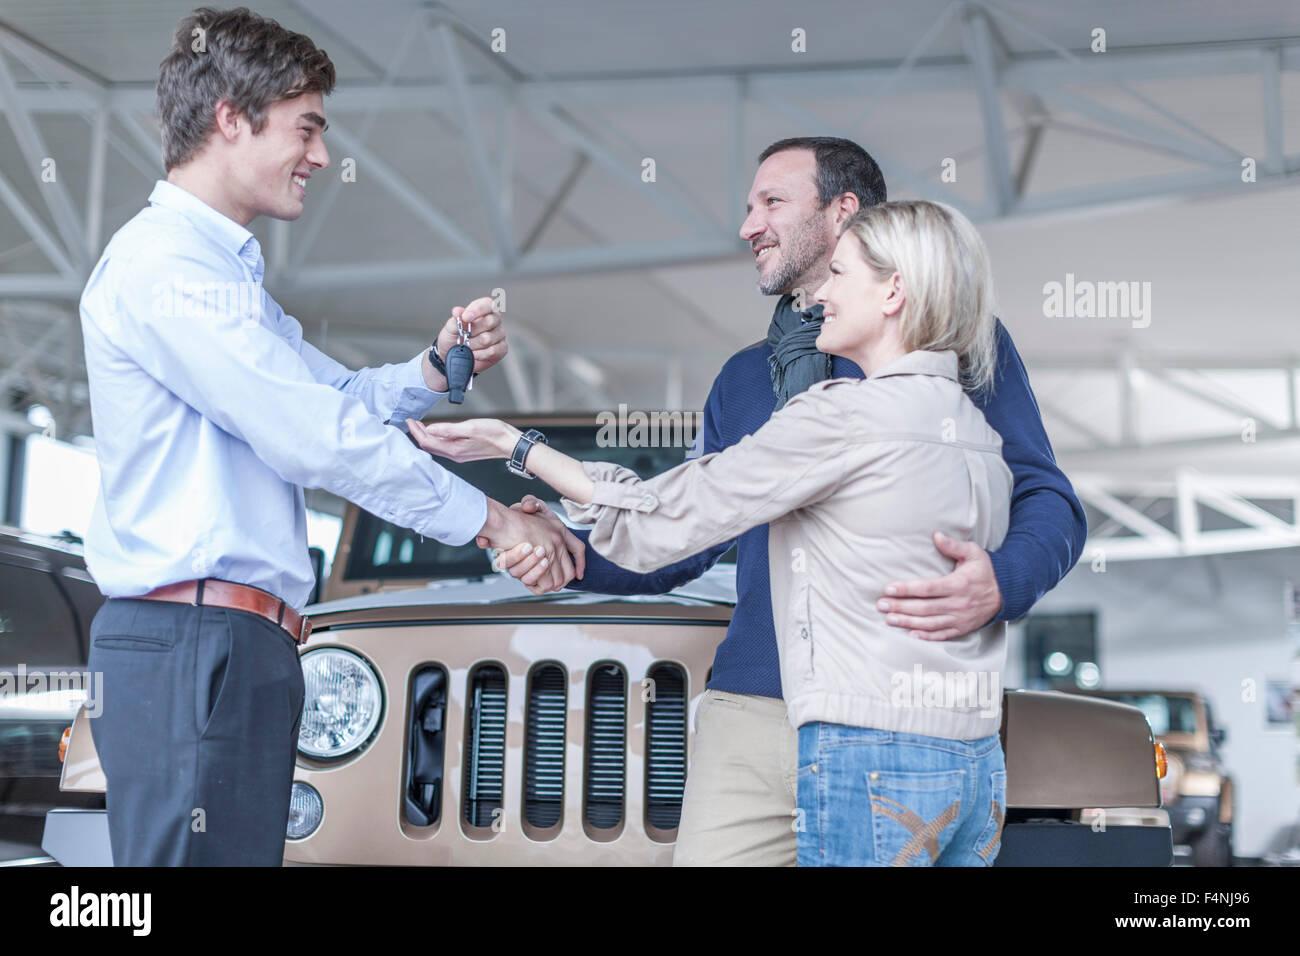 Kfz-Händler geben-Taste an client Stockbild